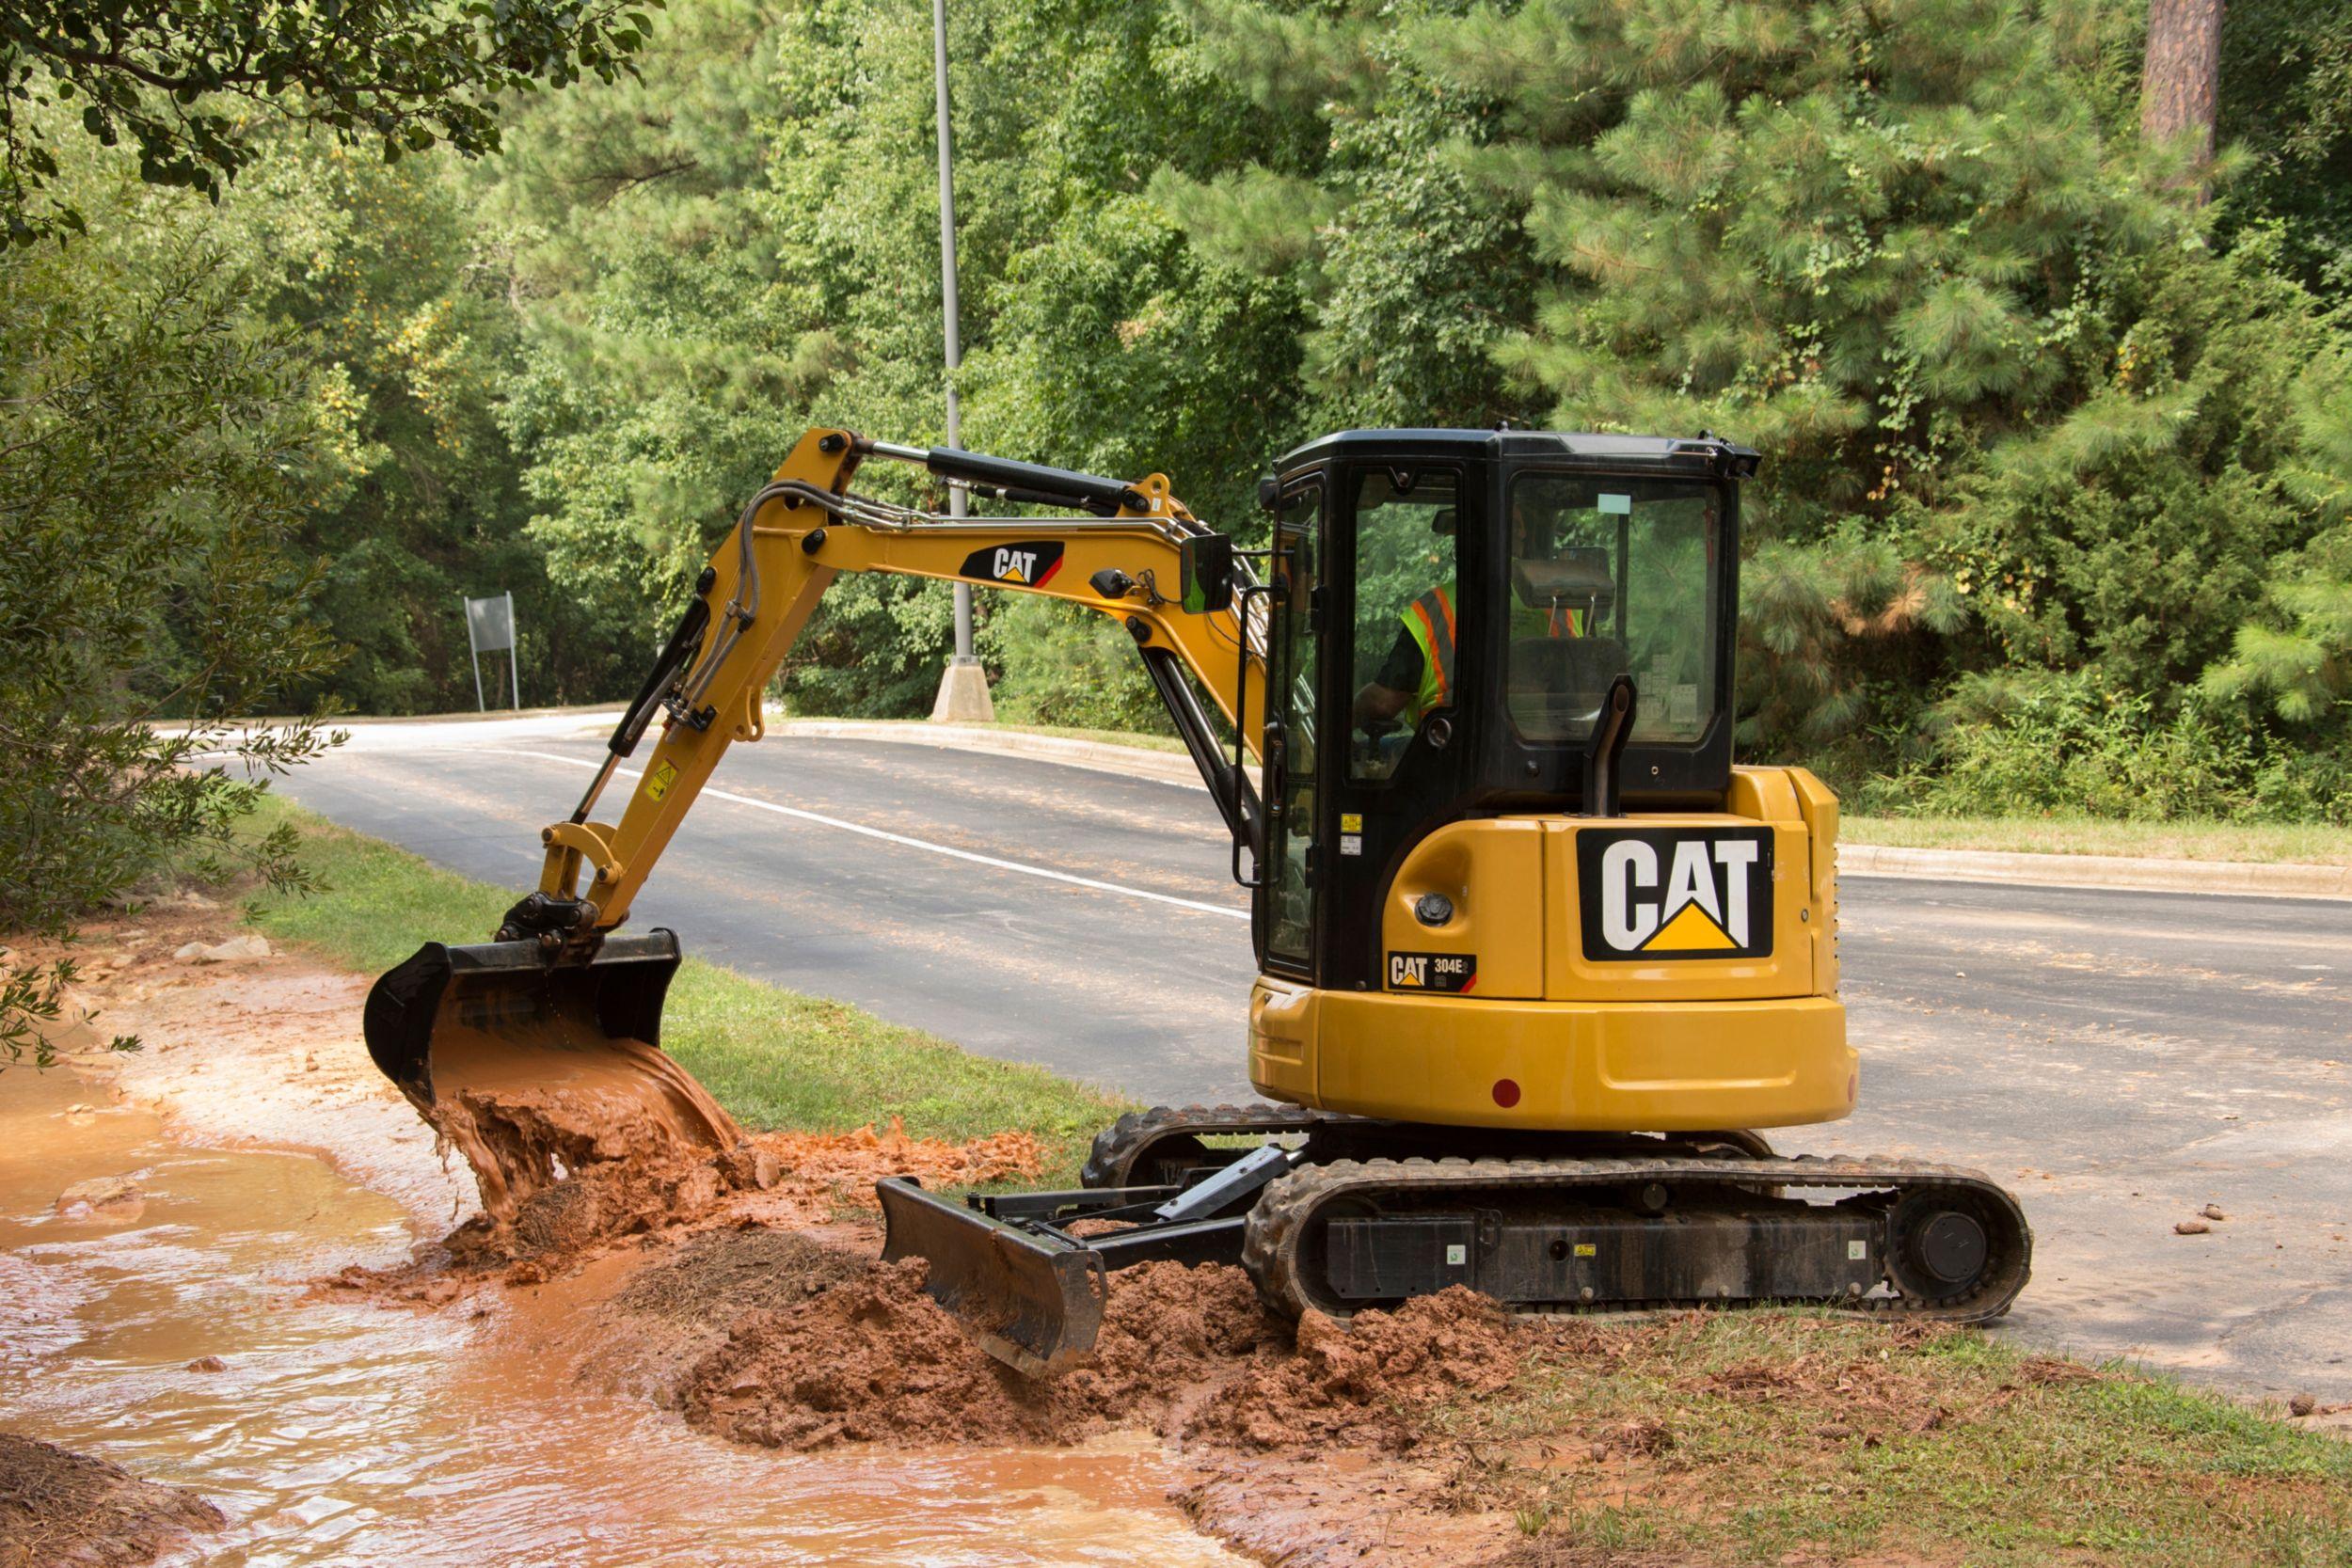 304E2 CR Mini Excavator